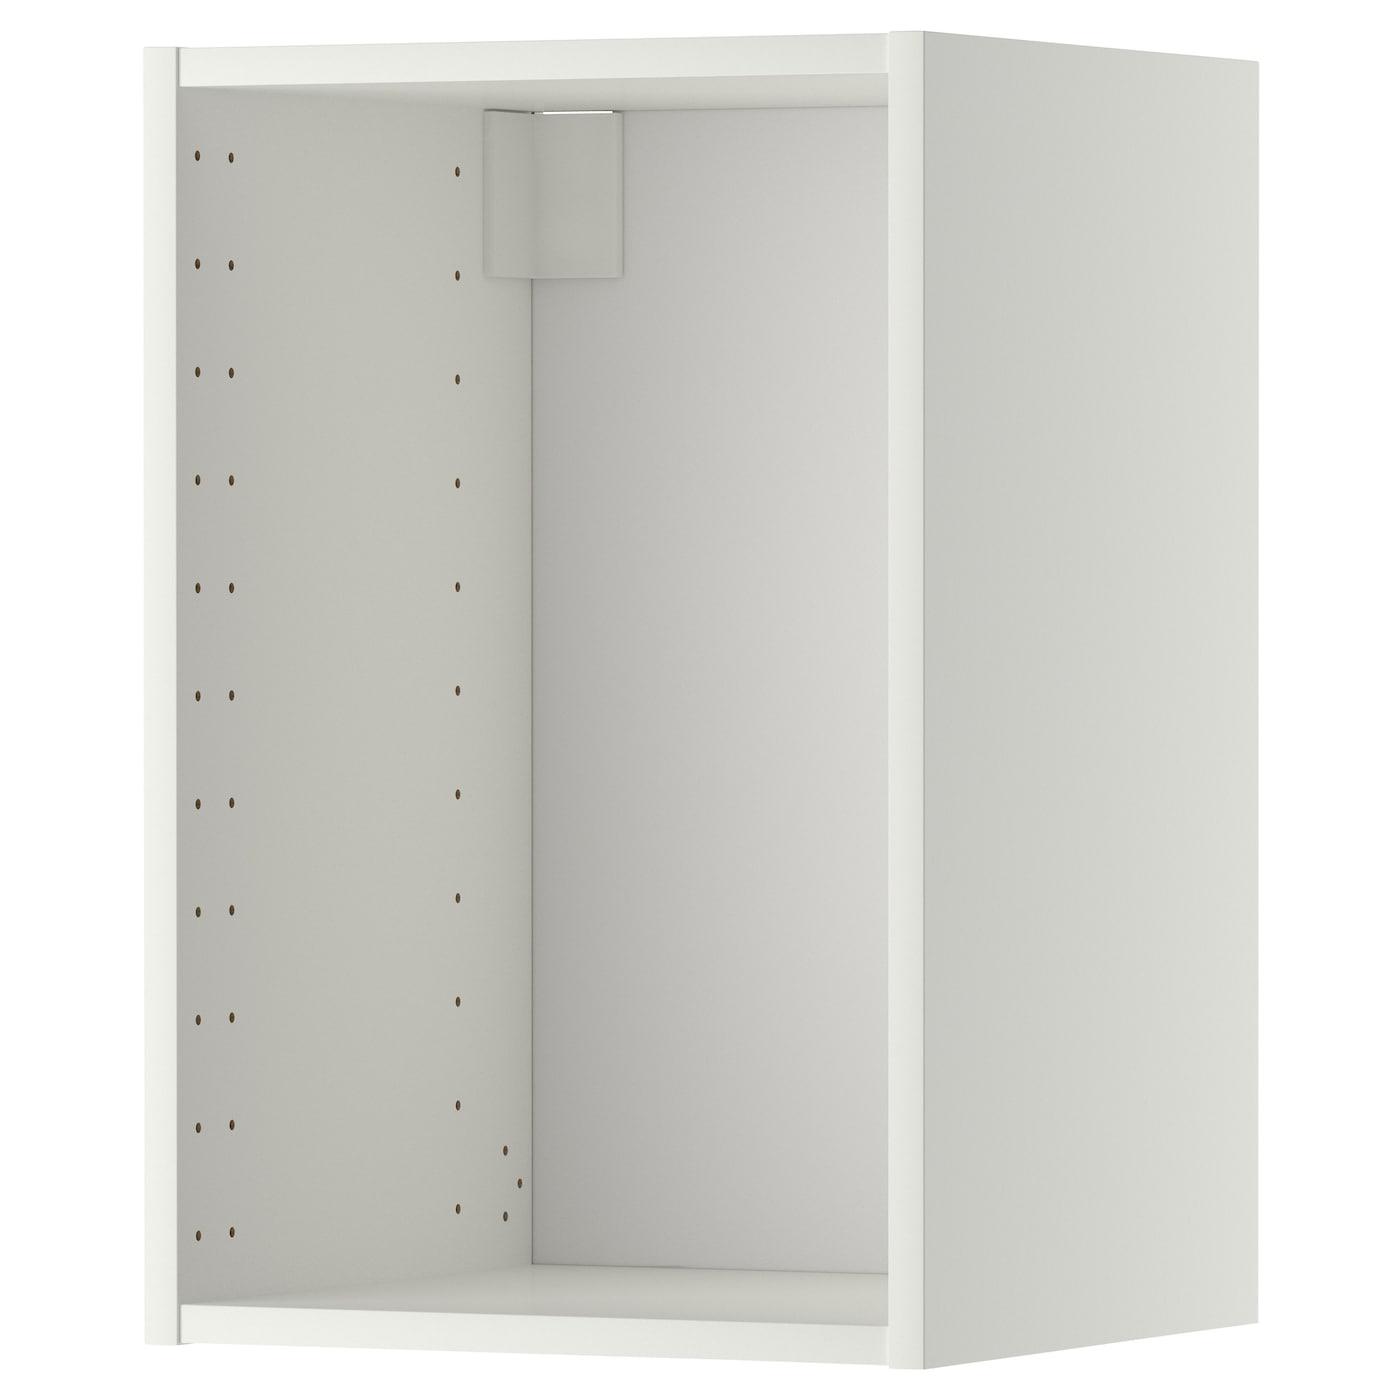 METOD Wall cabinet frame White 40 x 37 x 60 cm - IKEA